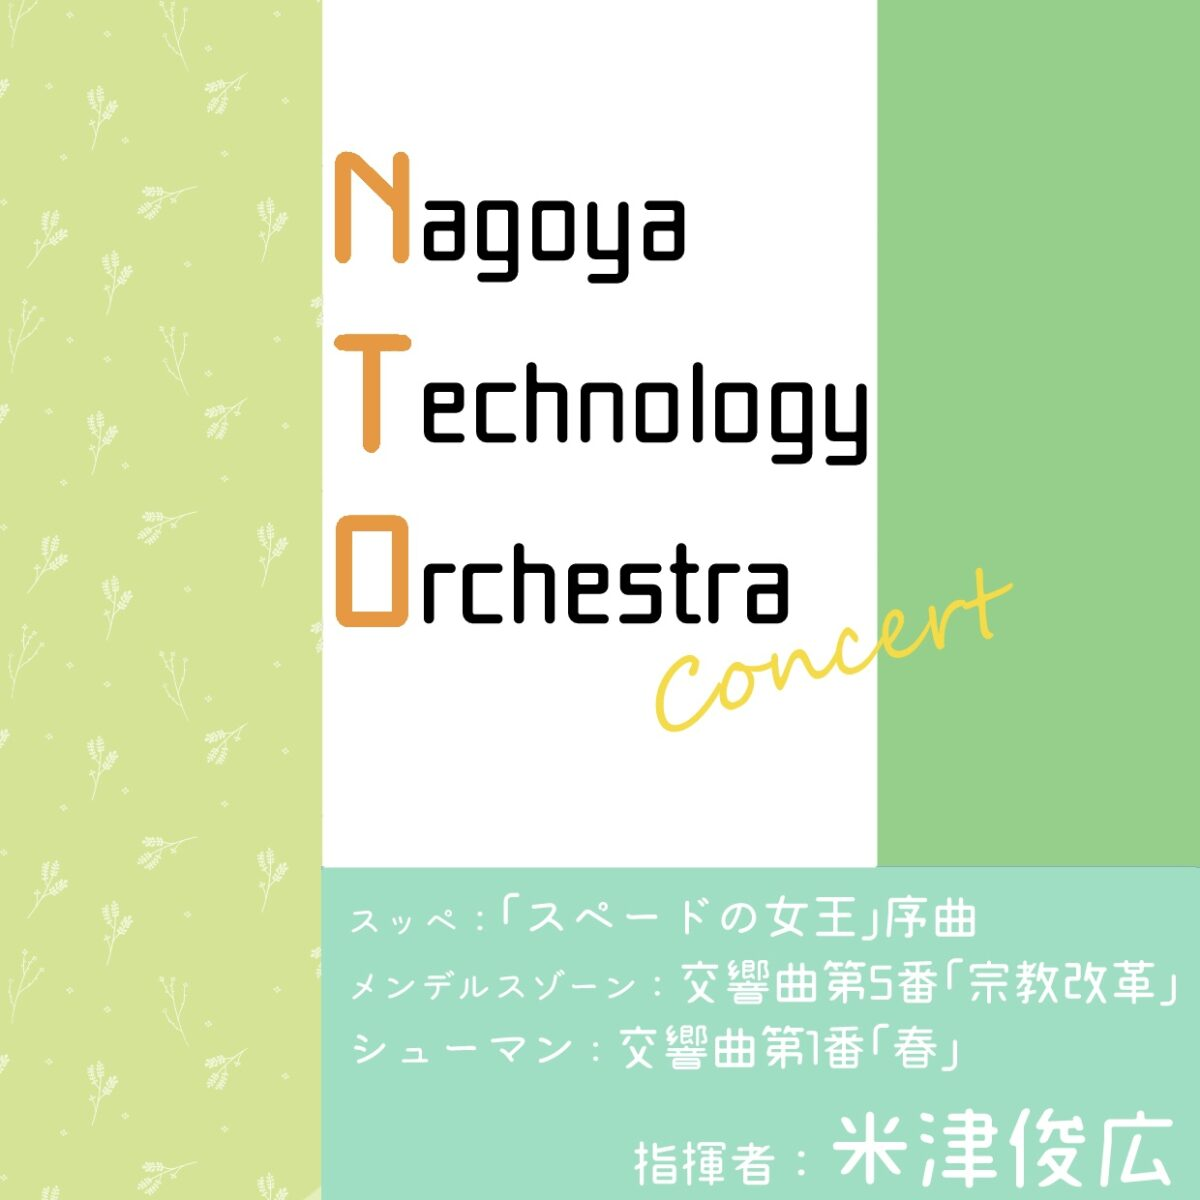 Nagoya Technology Orchestra Concert